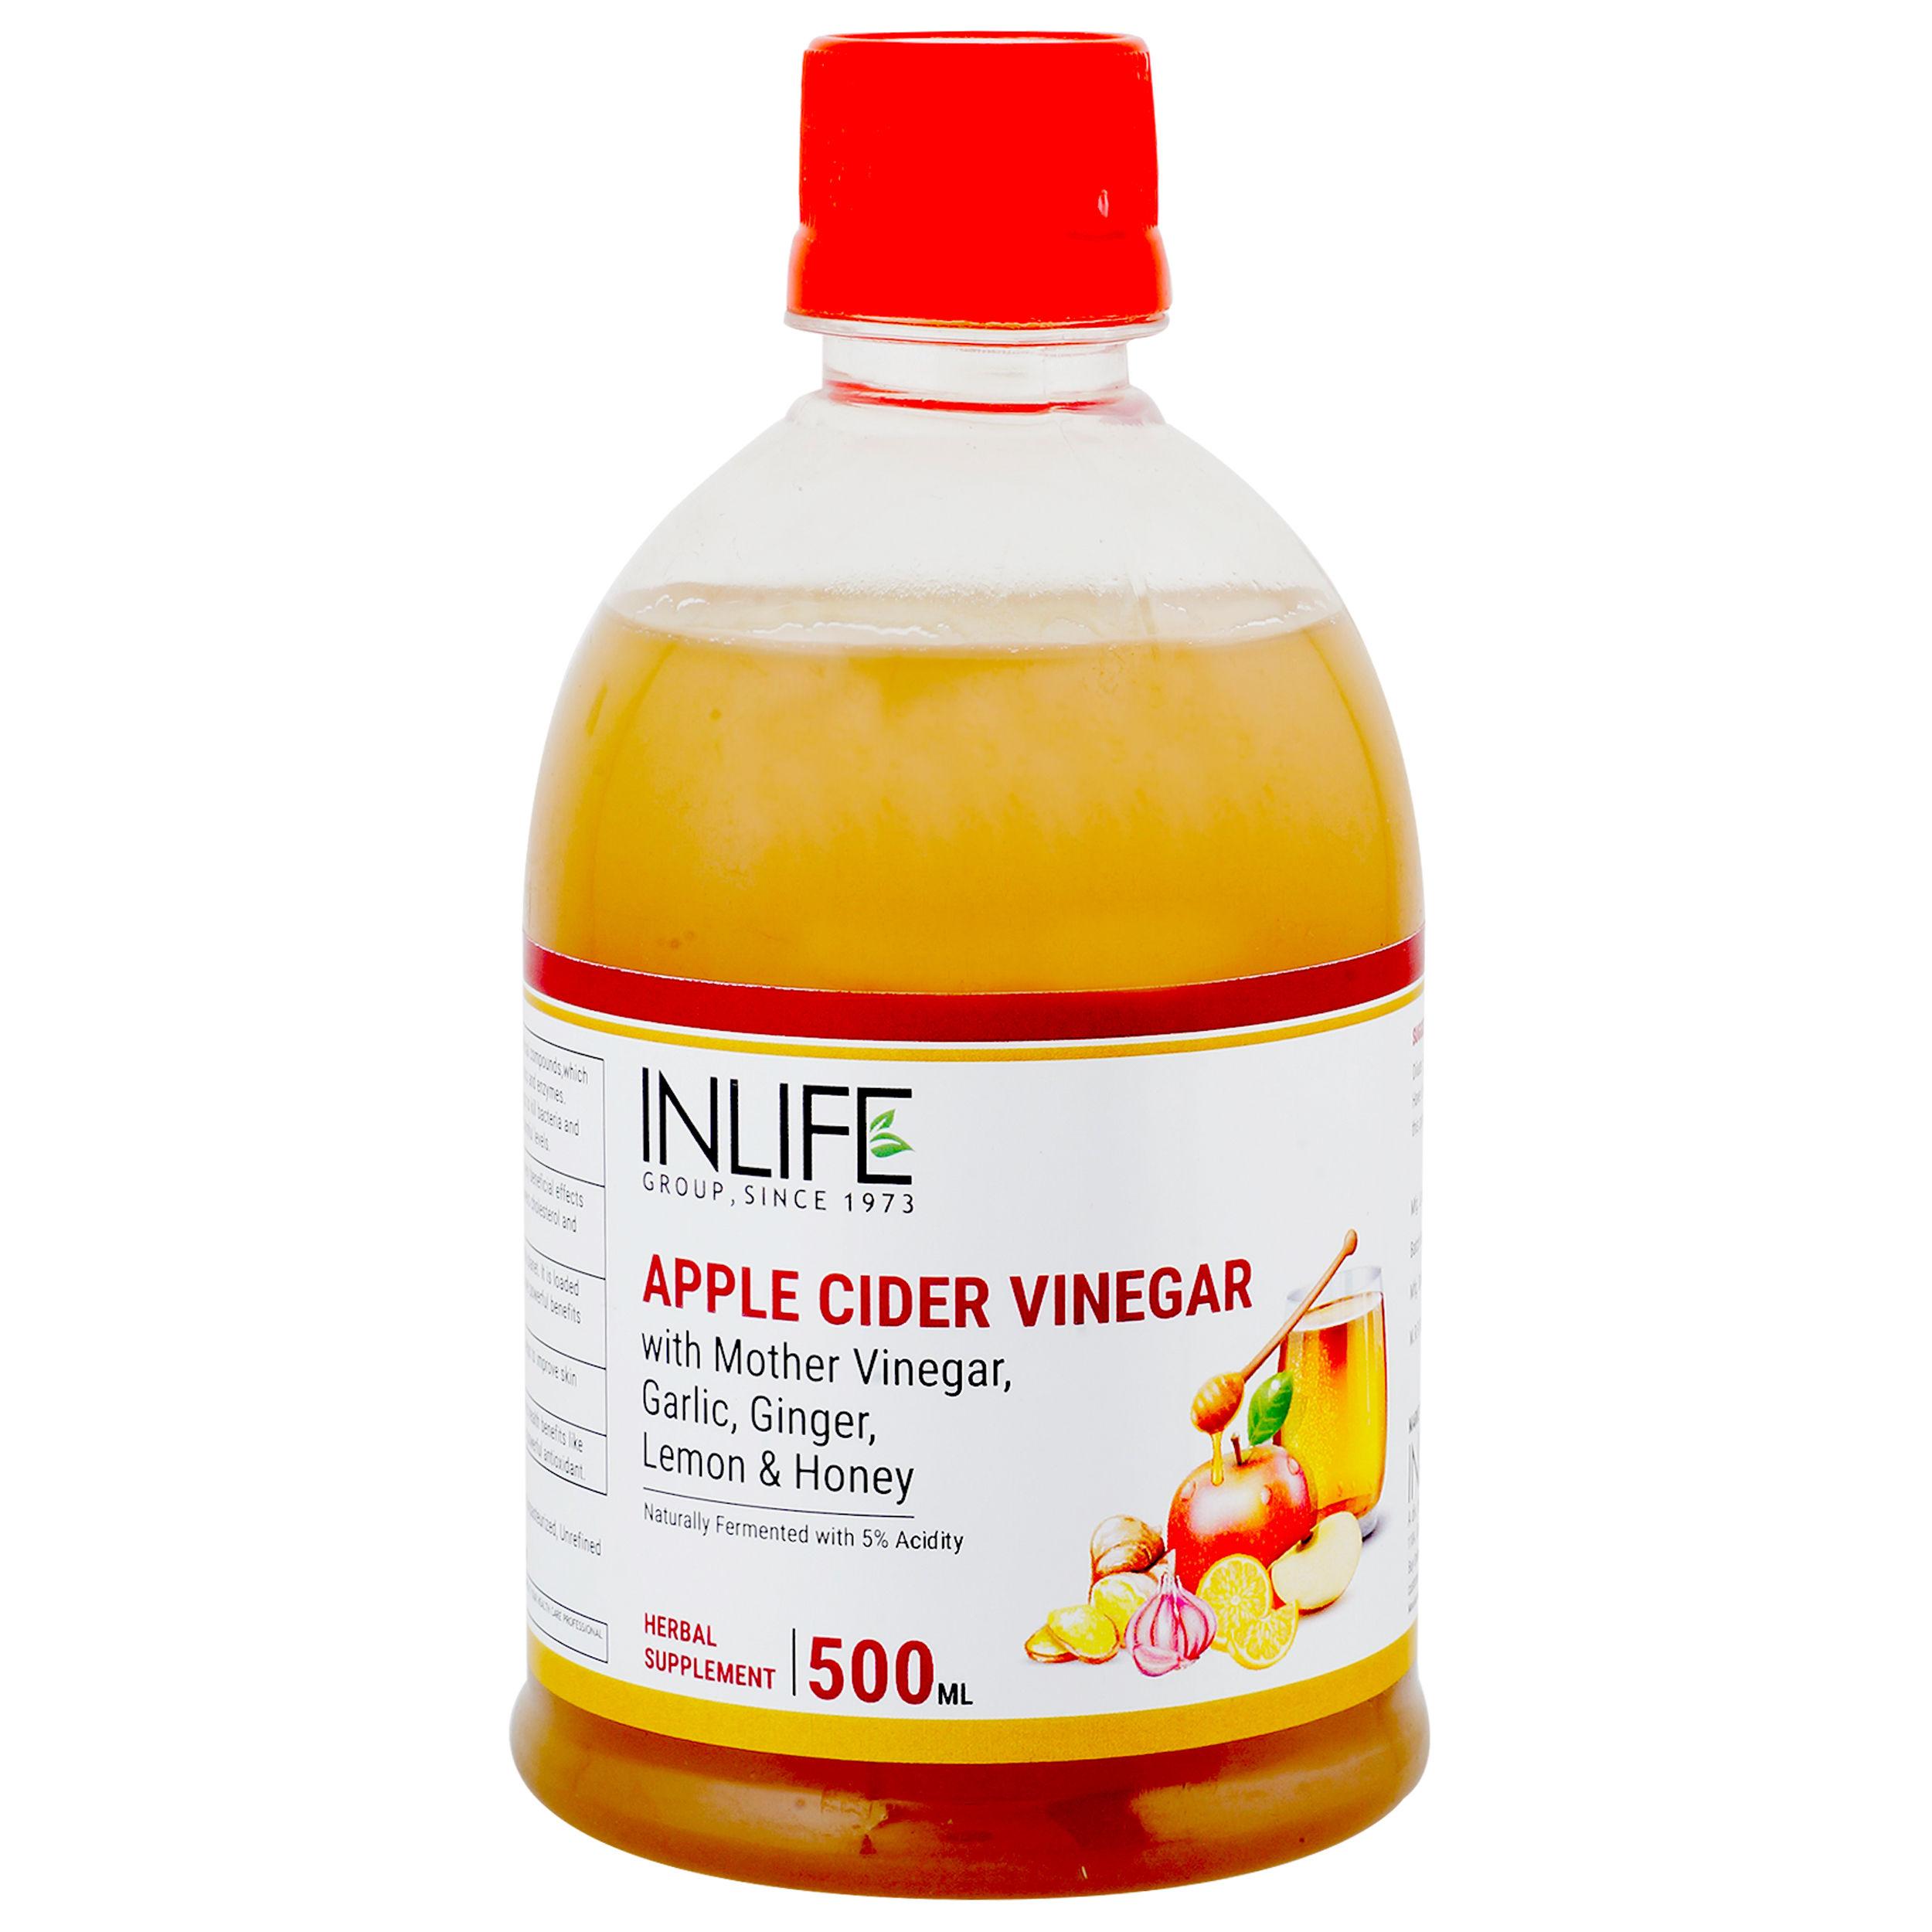 INLIFE Apple Cider Vinegar With Mother Of Vinegar, Garlic, Ginger, Lemon & Honey